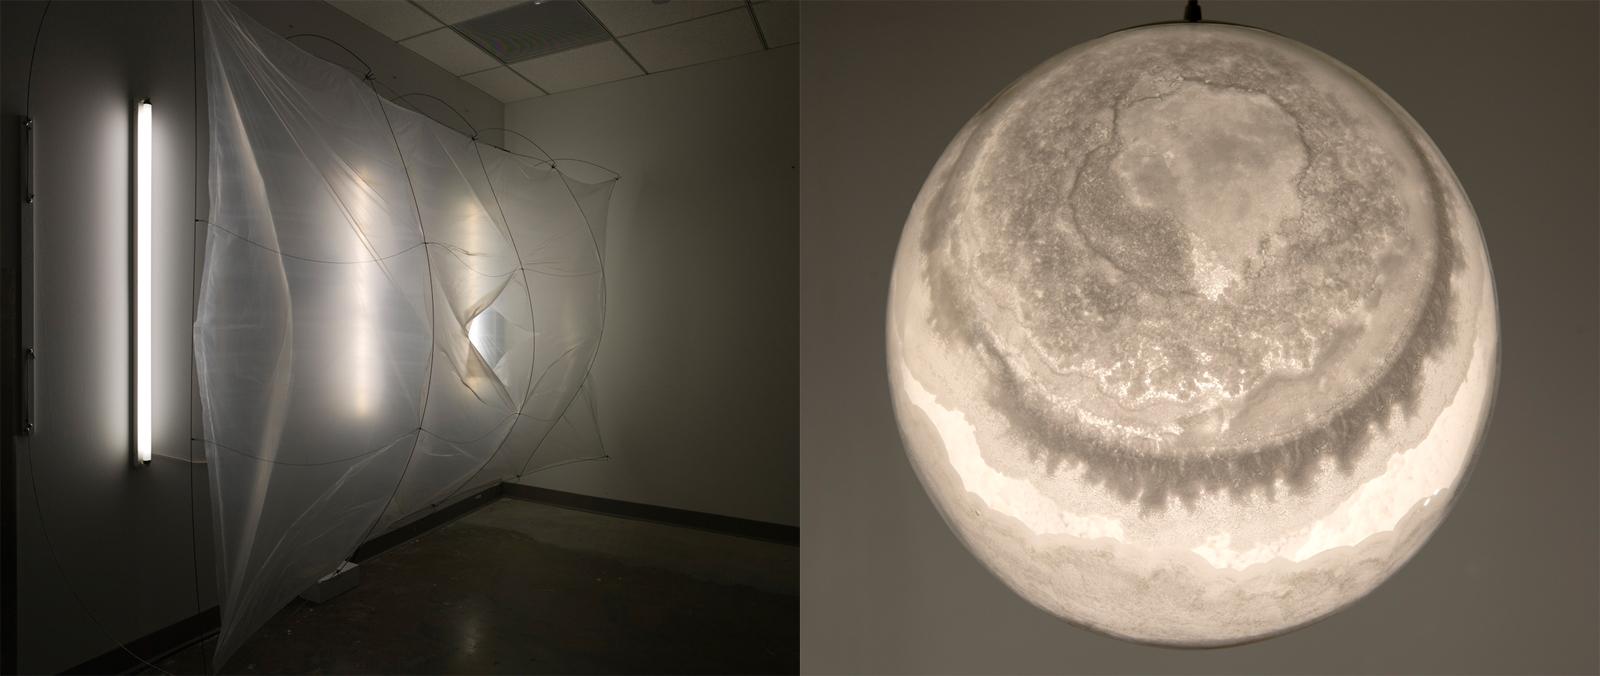 Left: Joseph Morris,  Immanence , 2013-16. Right: William Lamson,  An Invisible Universe , 2017